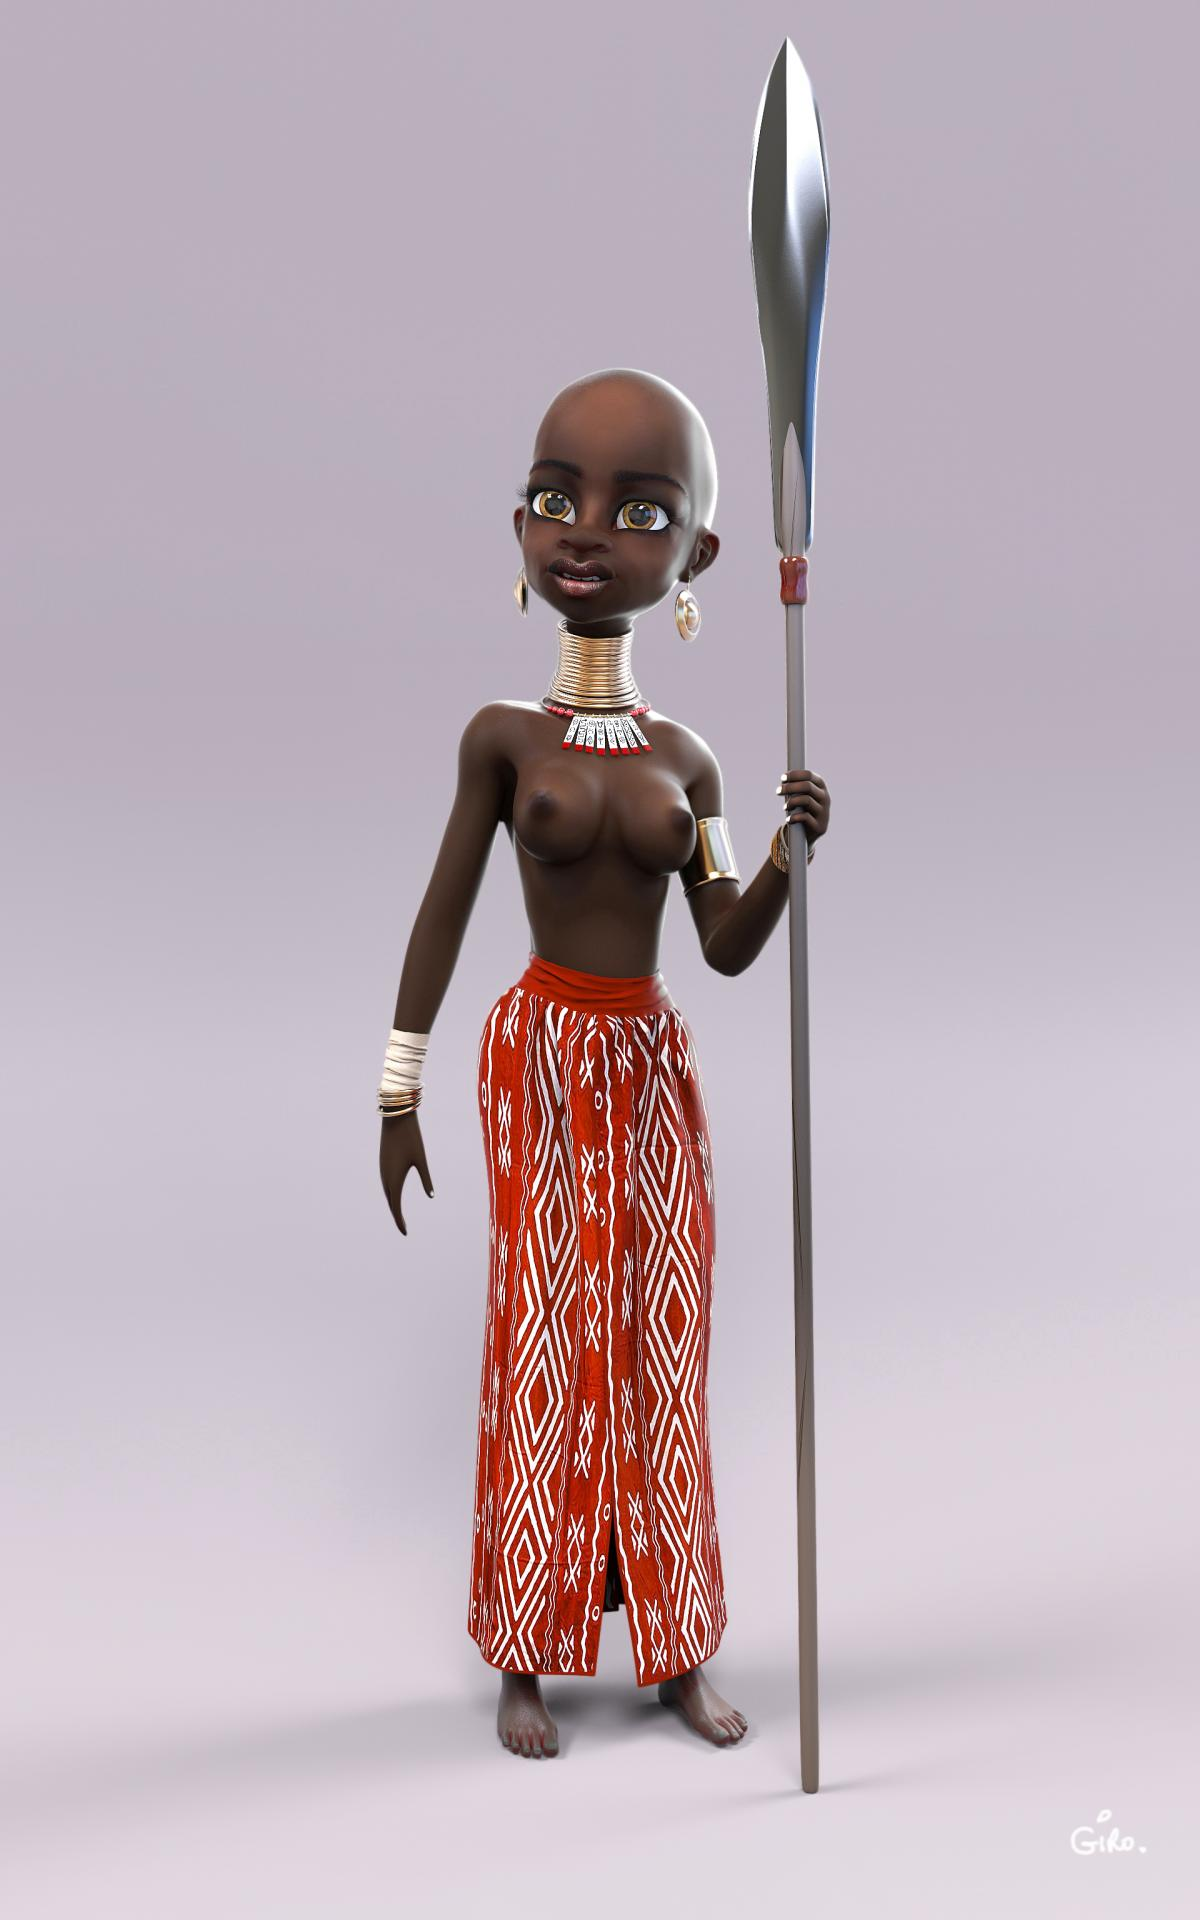 bibi africa.